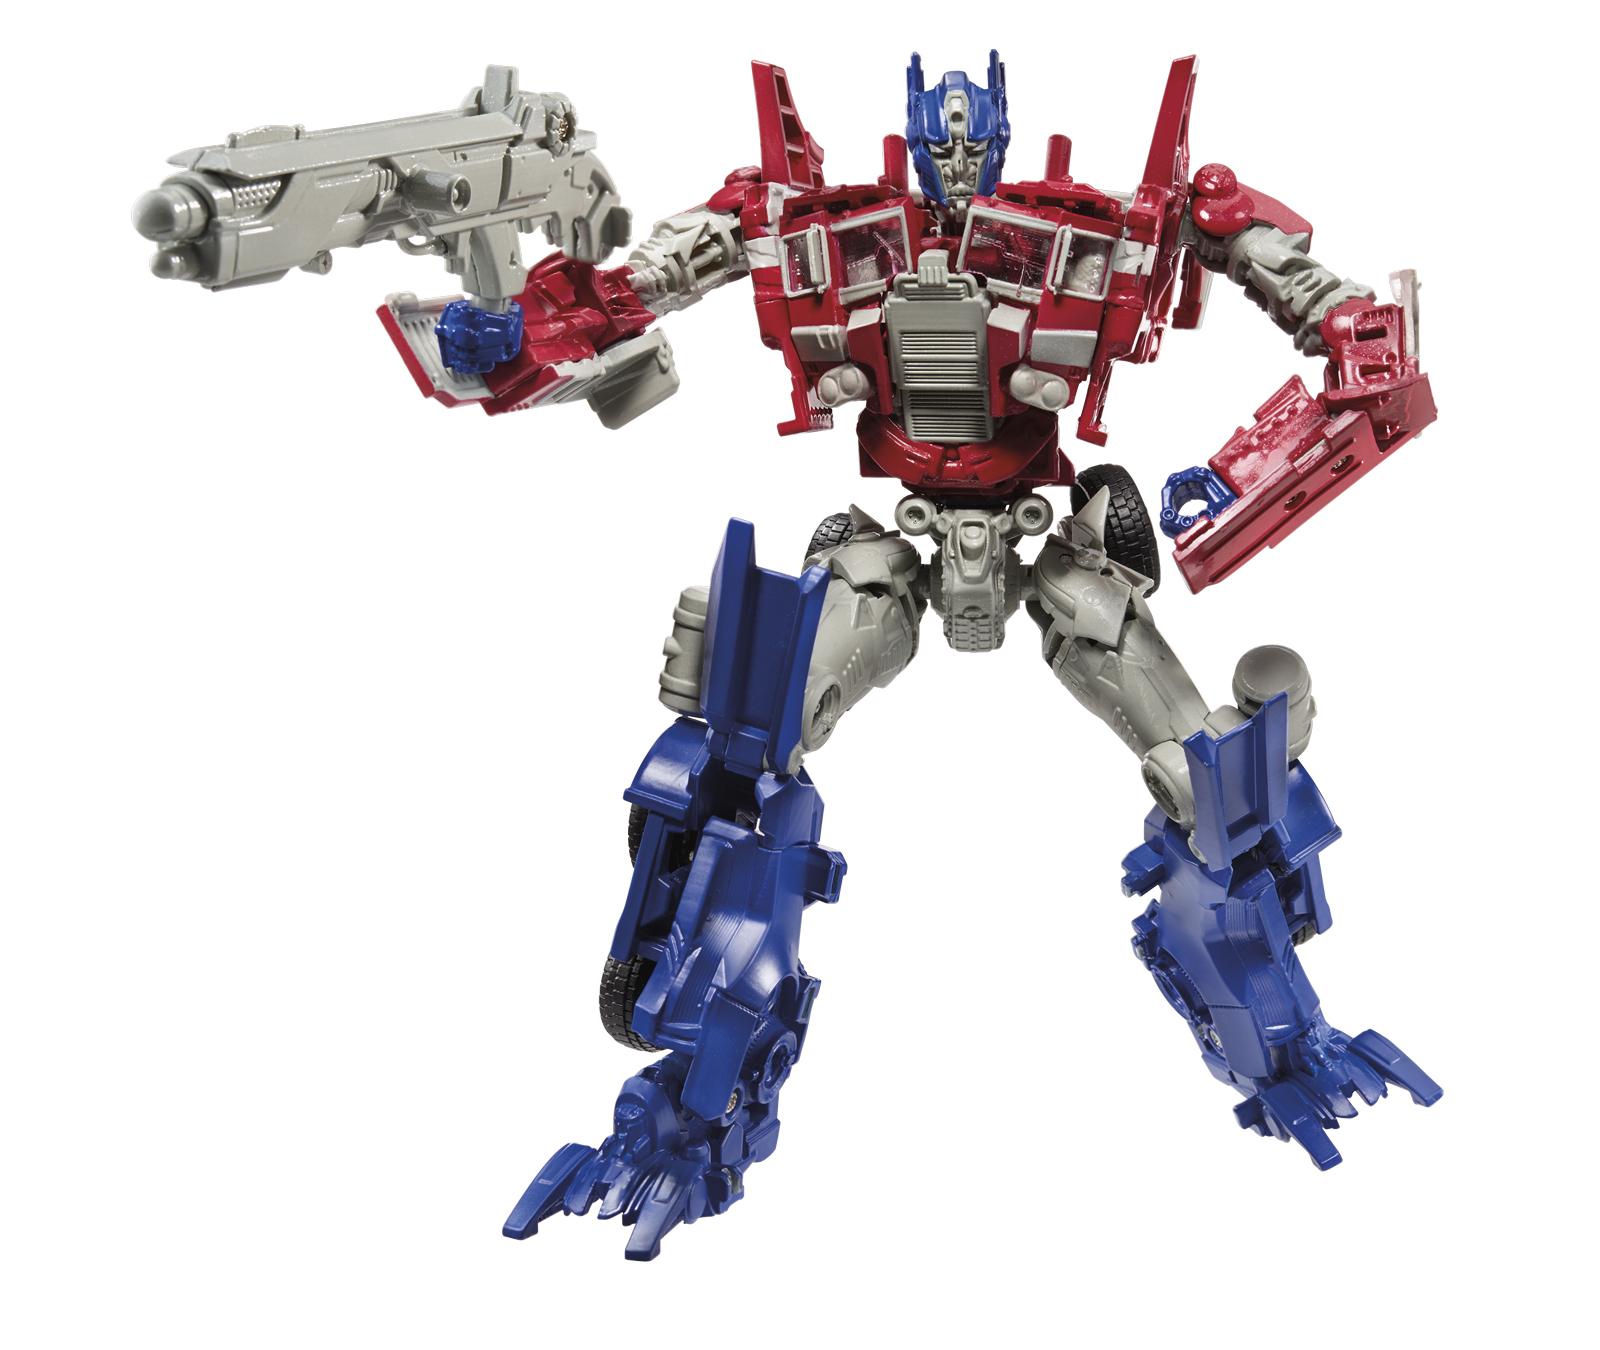 2014 Transformers 4 AGE OF Extinction Optimus Prime ...